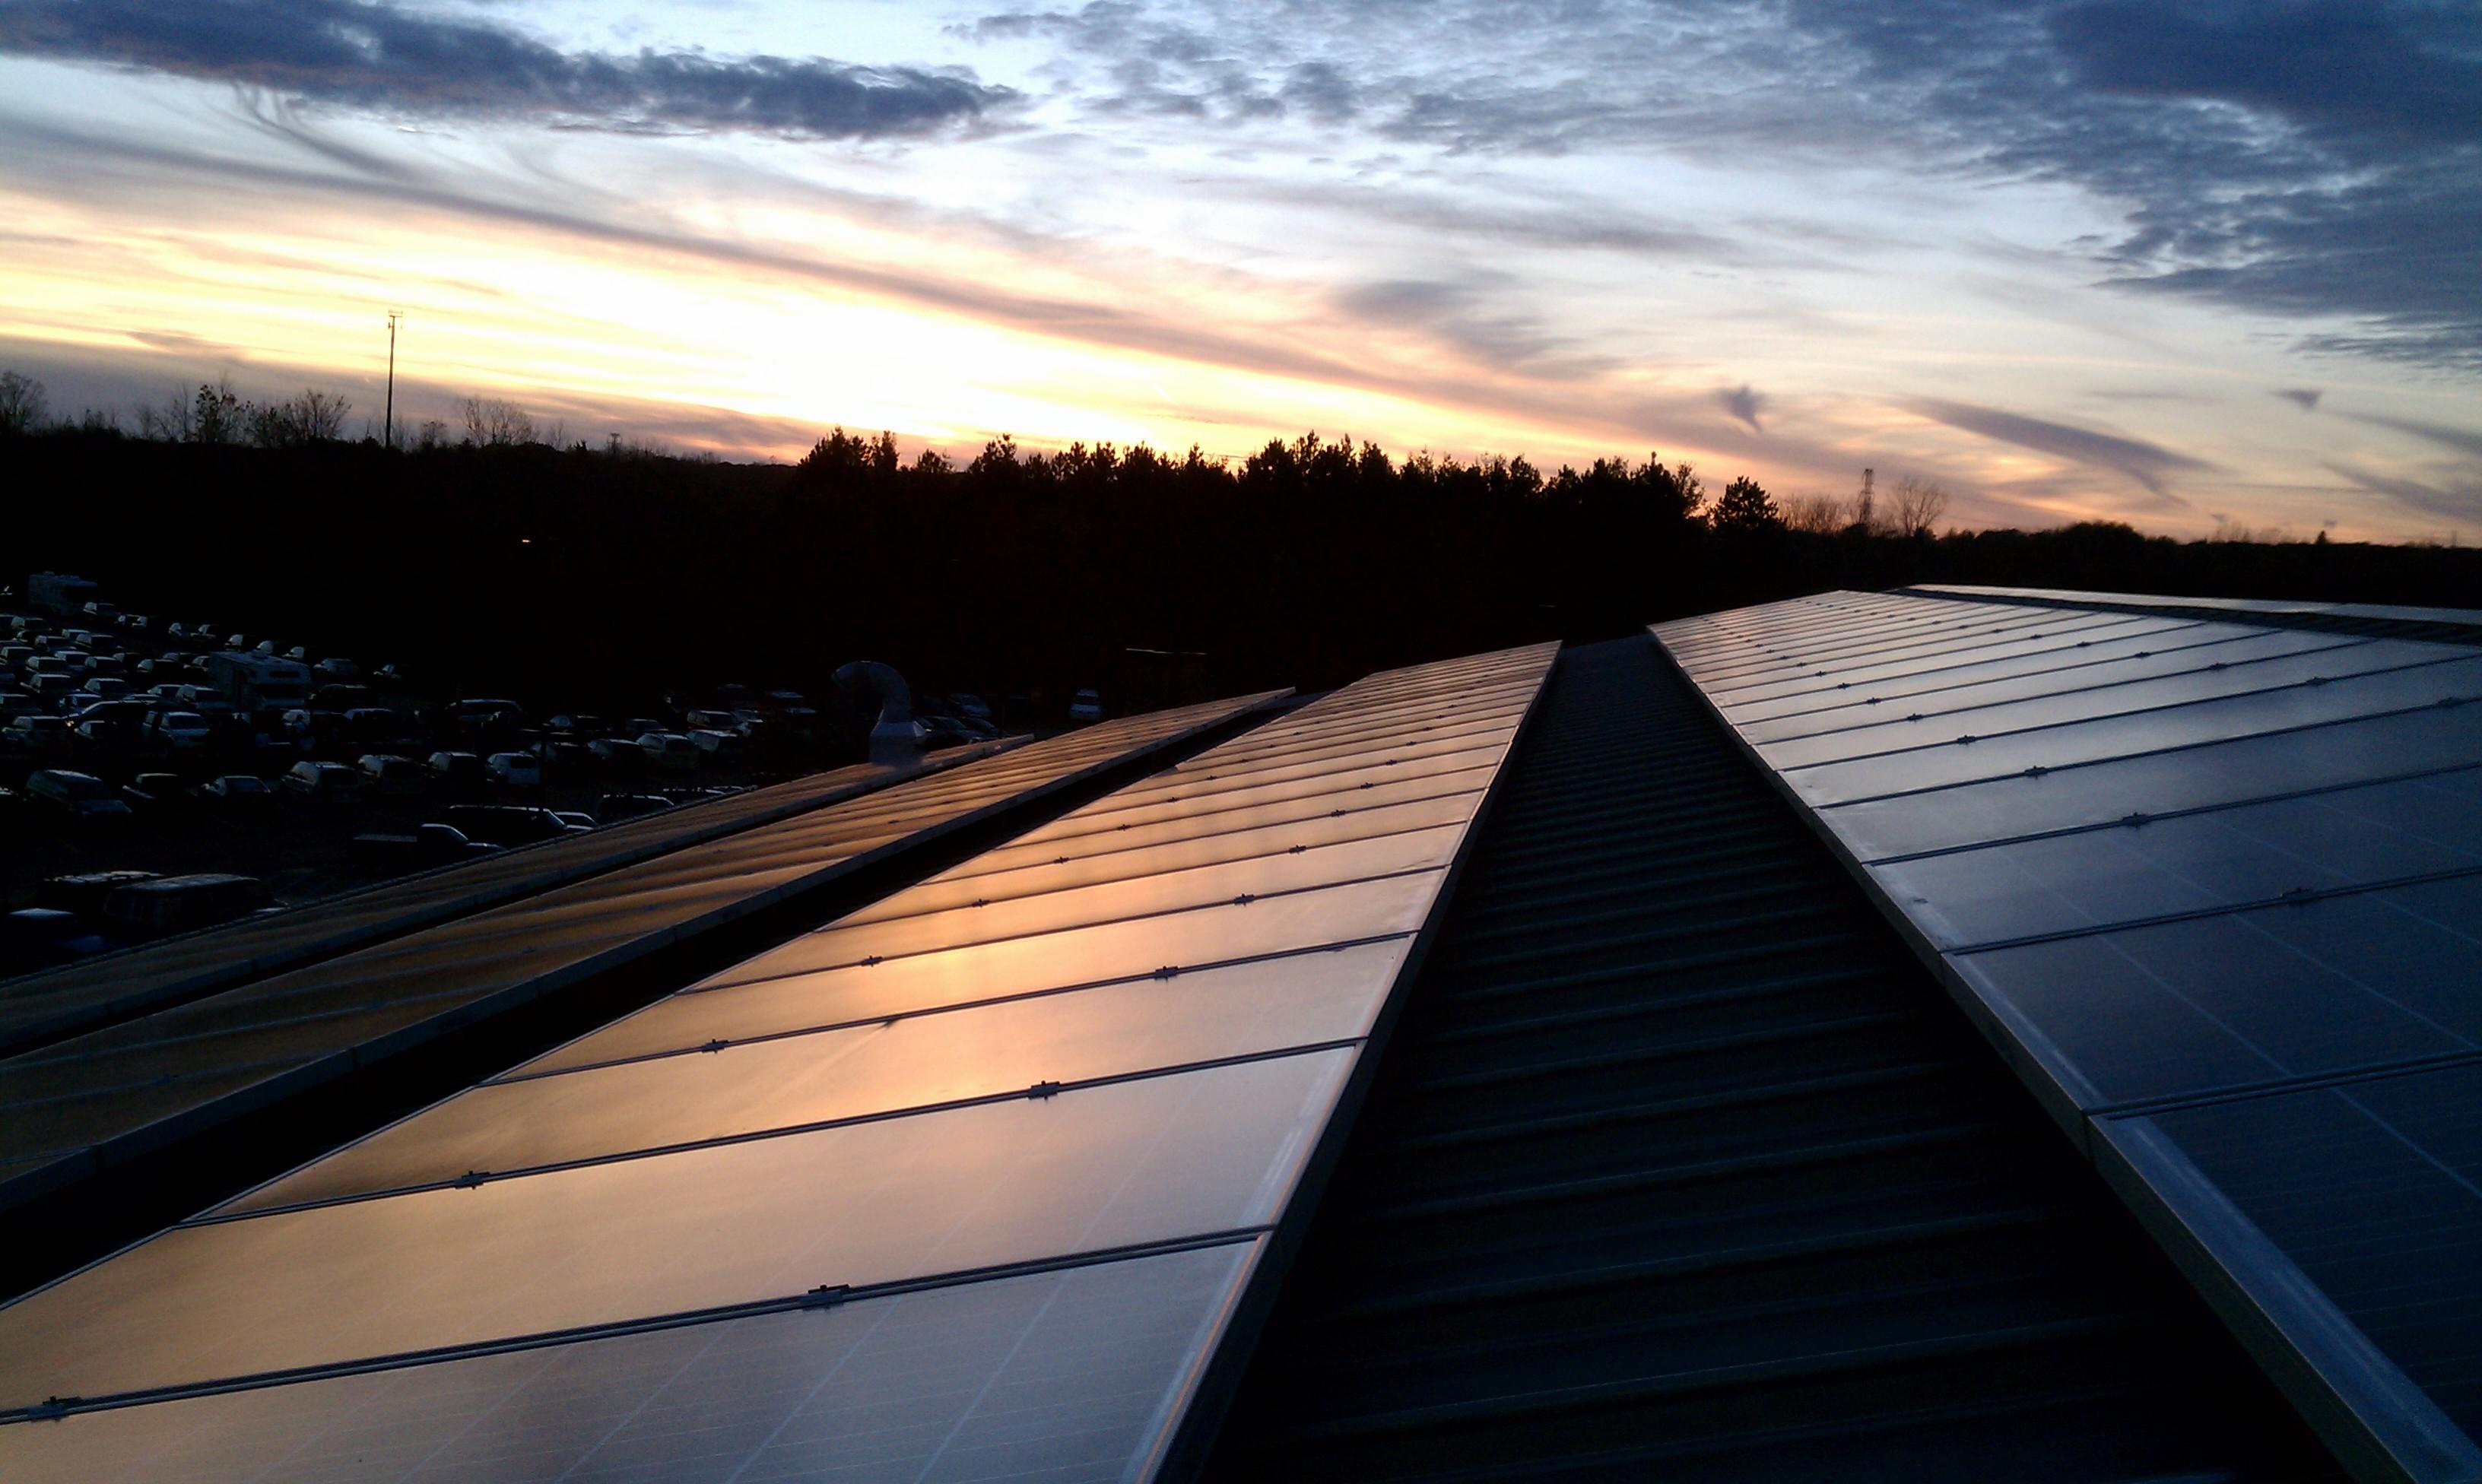 School solar array